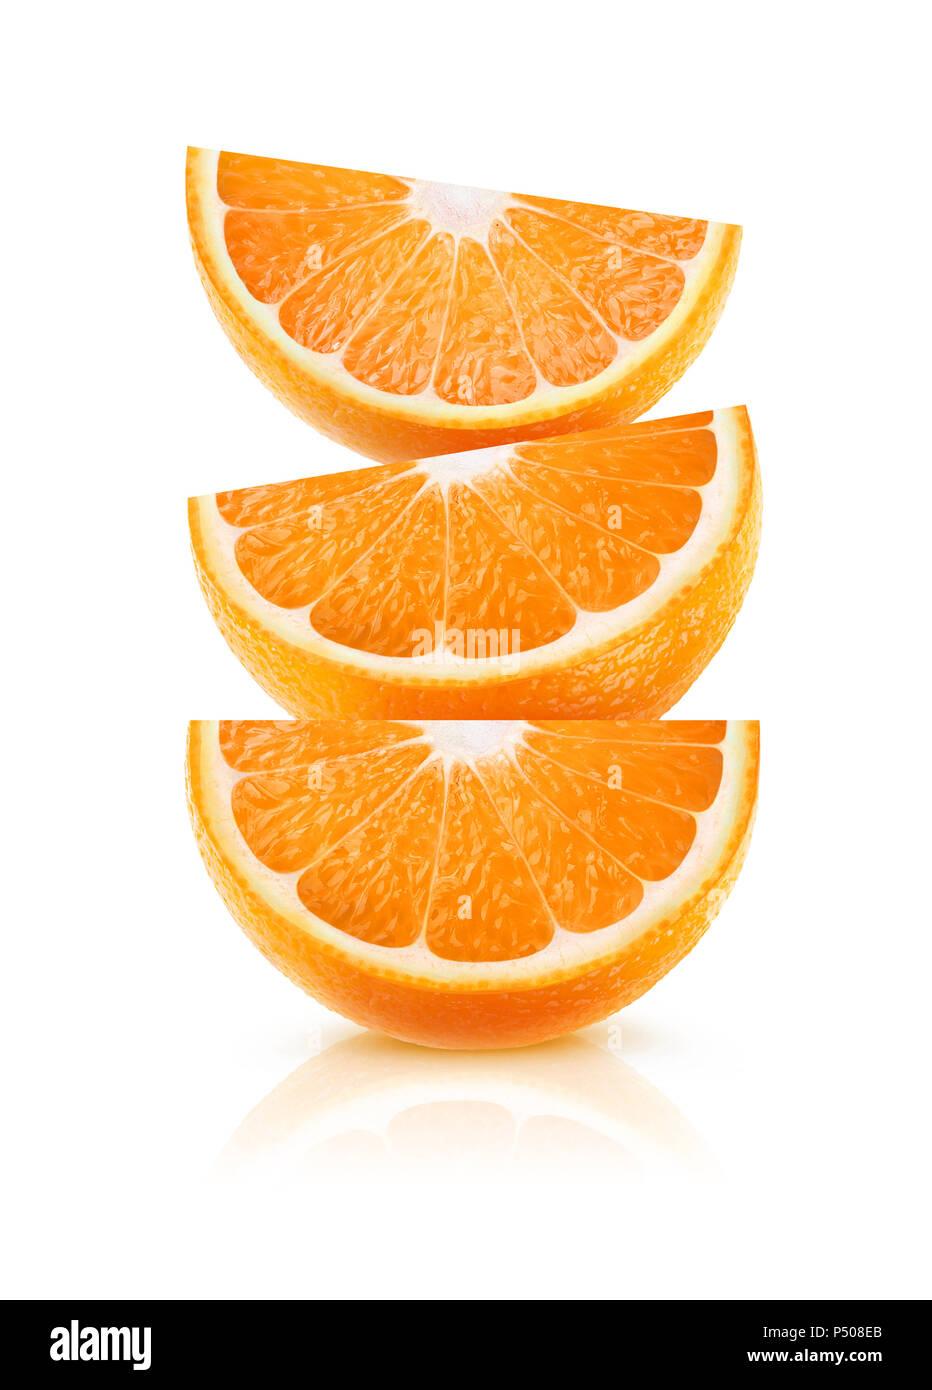 Orange Wedge Cut Out Food Stockfotos Orange Wedge Cut Out Food